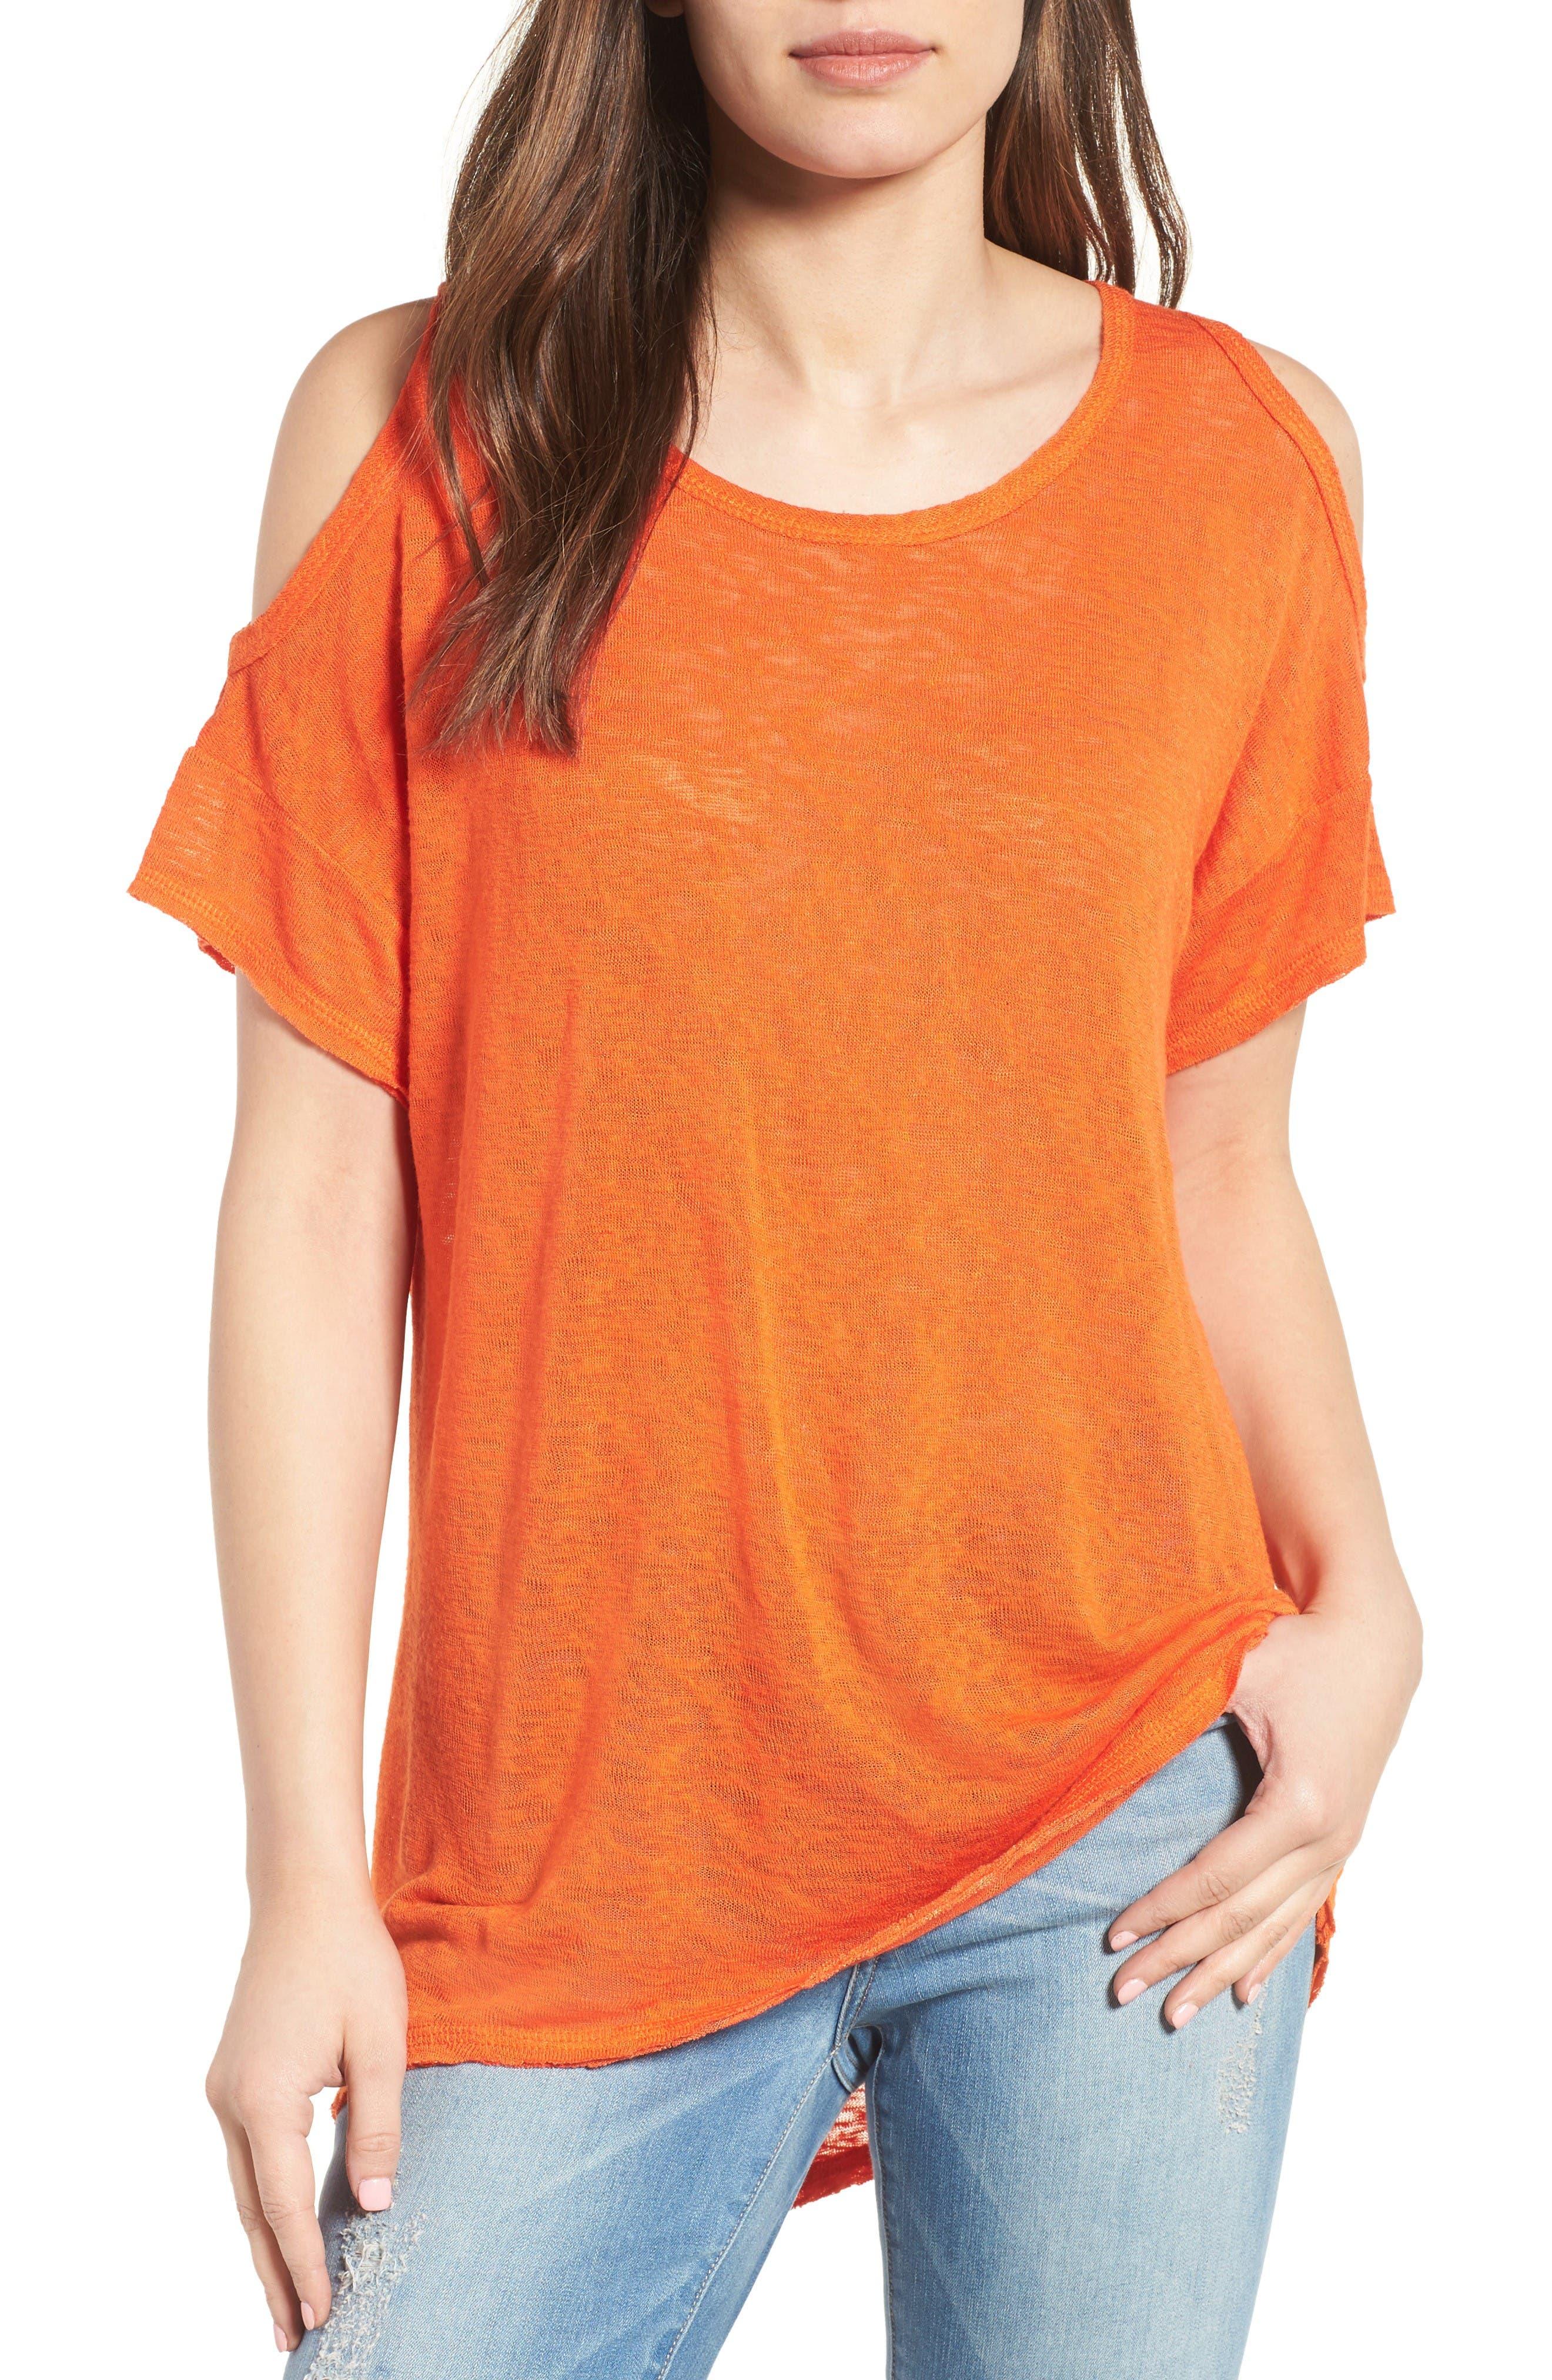 Main Image - Bobeau Cold Shoulder Slub Knit Tee (Regular & Petite)